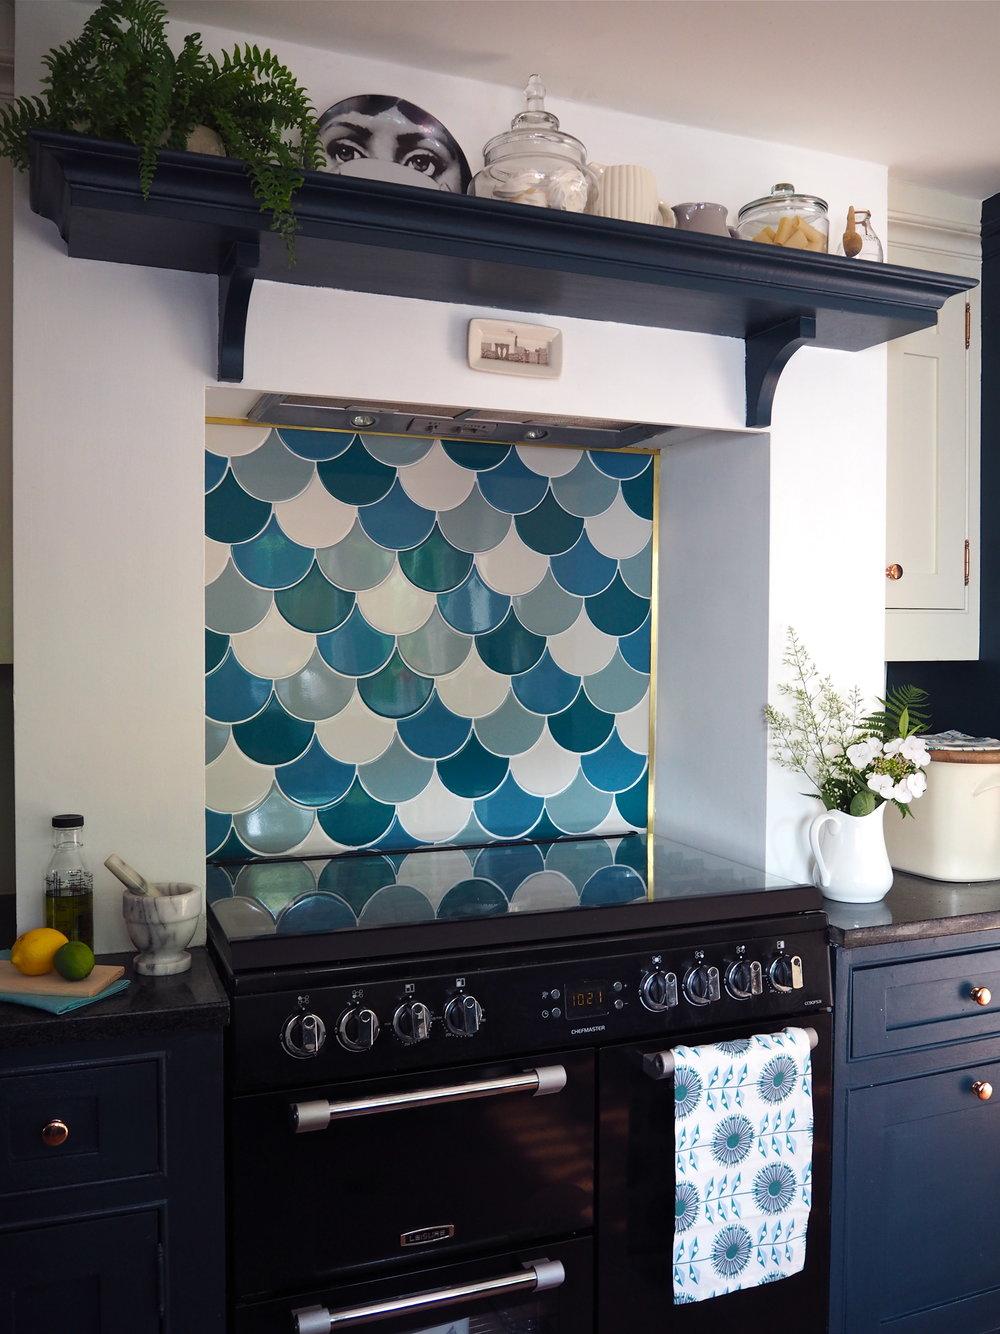 DIY Kitchen Splashback With The Syren Tiles by Topps Tiles — MELANIE ...